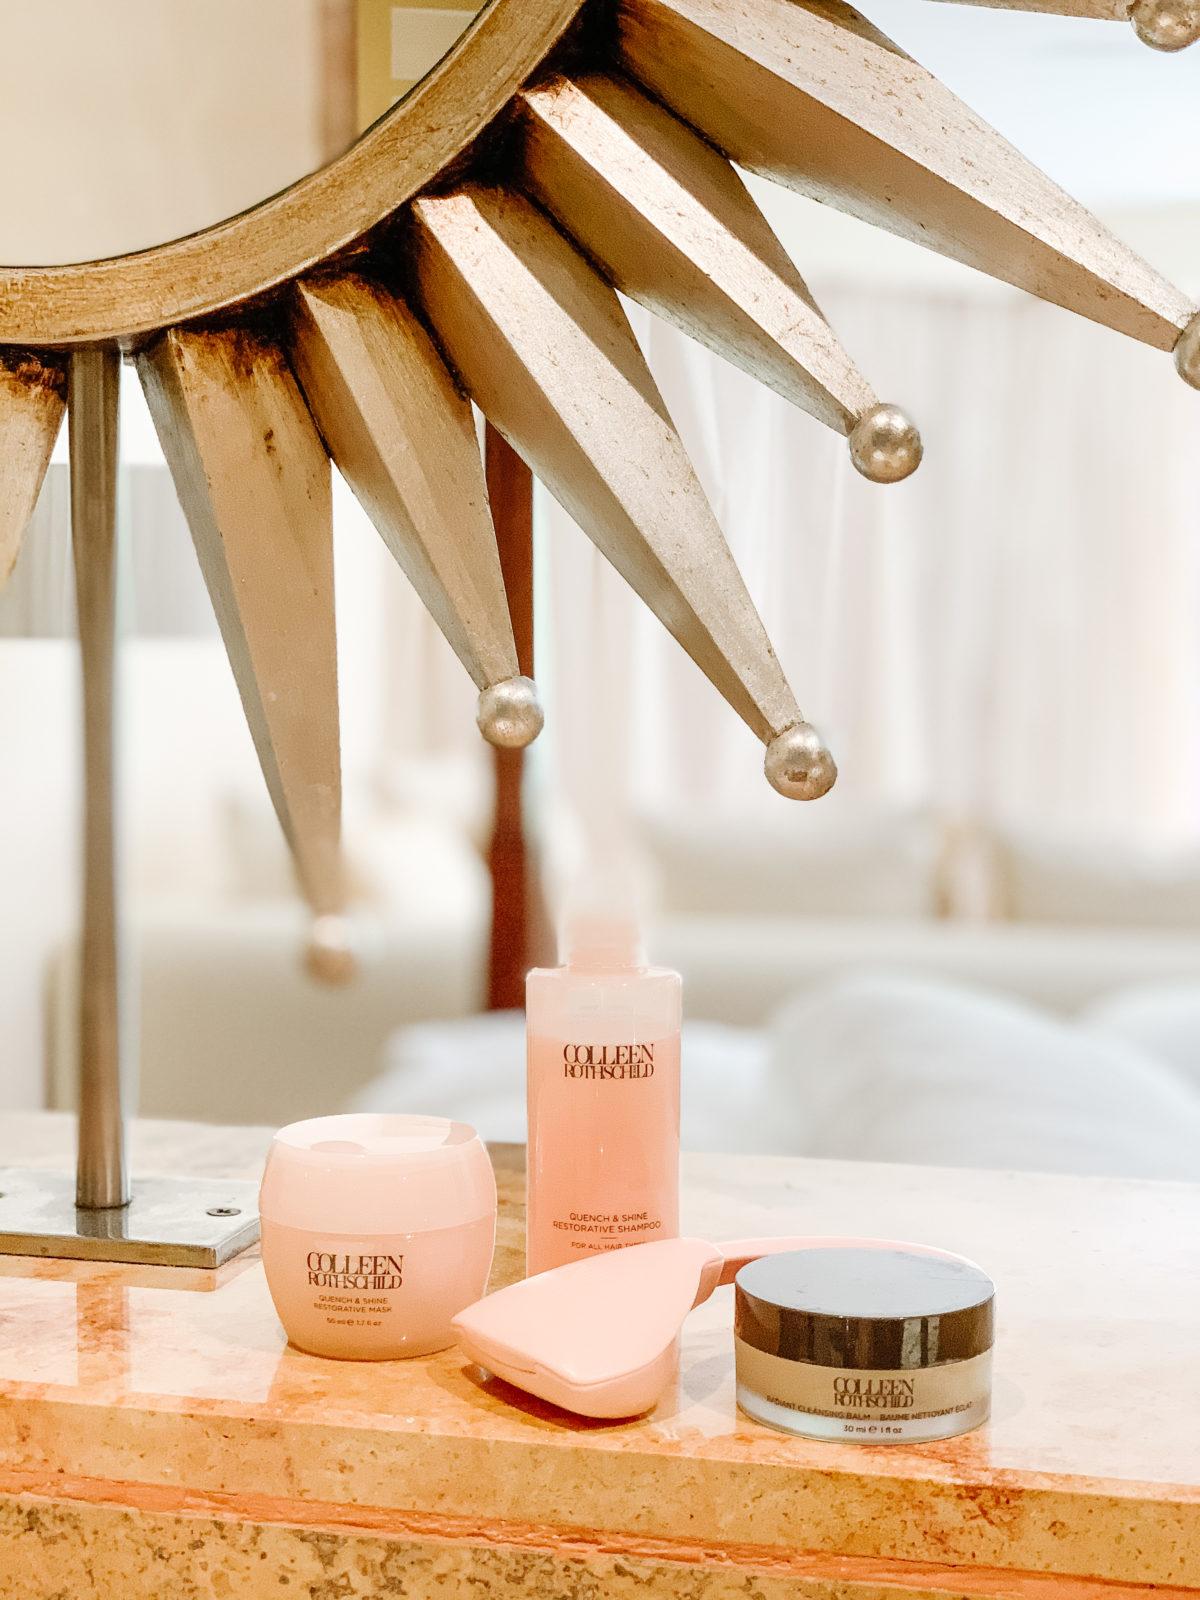 Beauty Essentials, Shine Mask, Shampoo, Billie Razor, Cleansing Balm